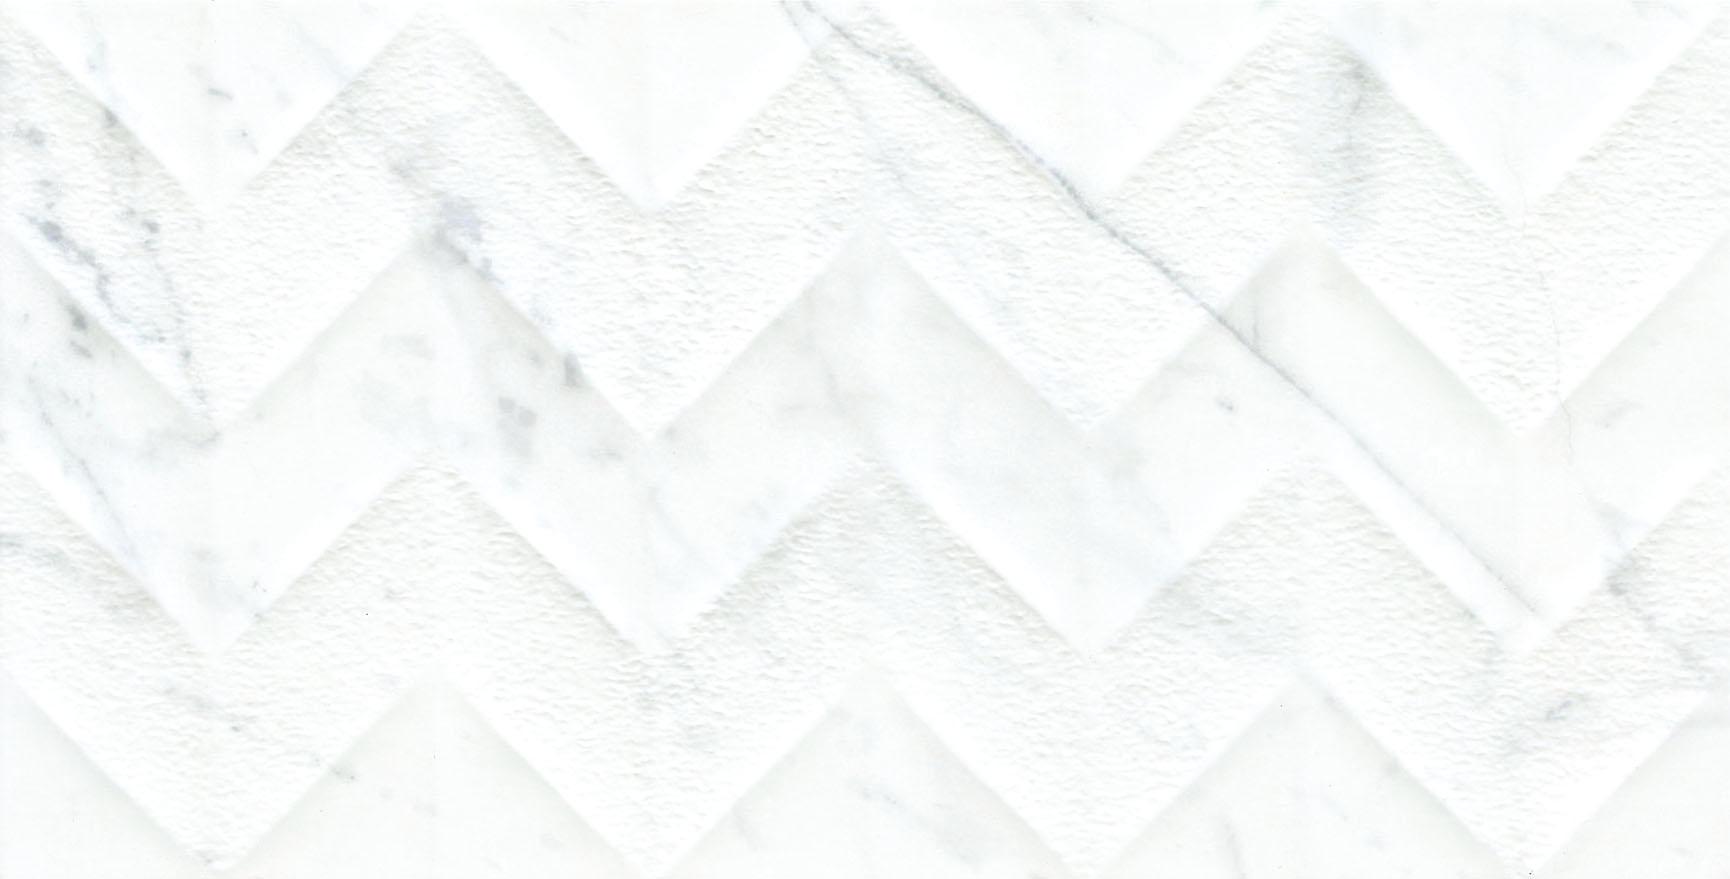 LONGFAVOR white 300x600mm Ceramic Wall Tile oem Coffee Bars-2